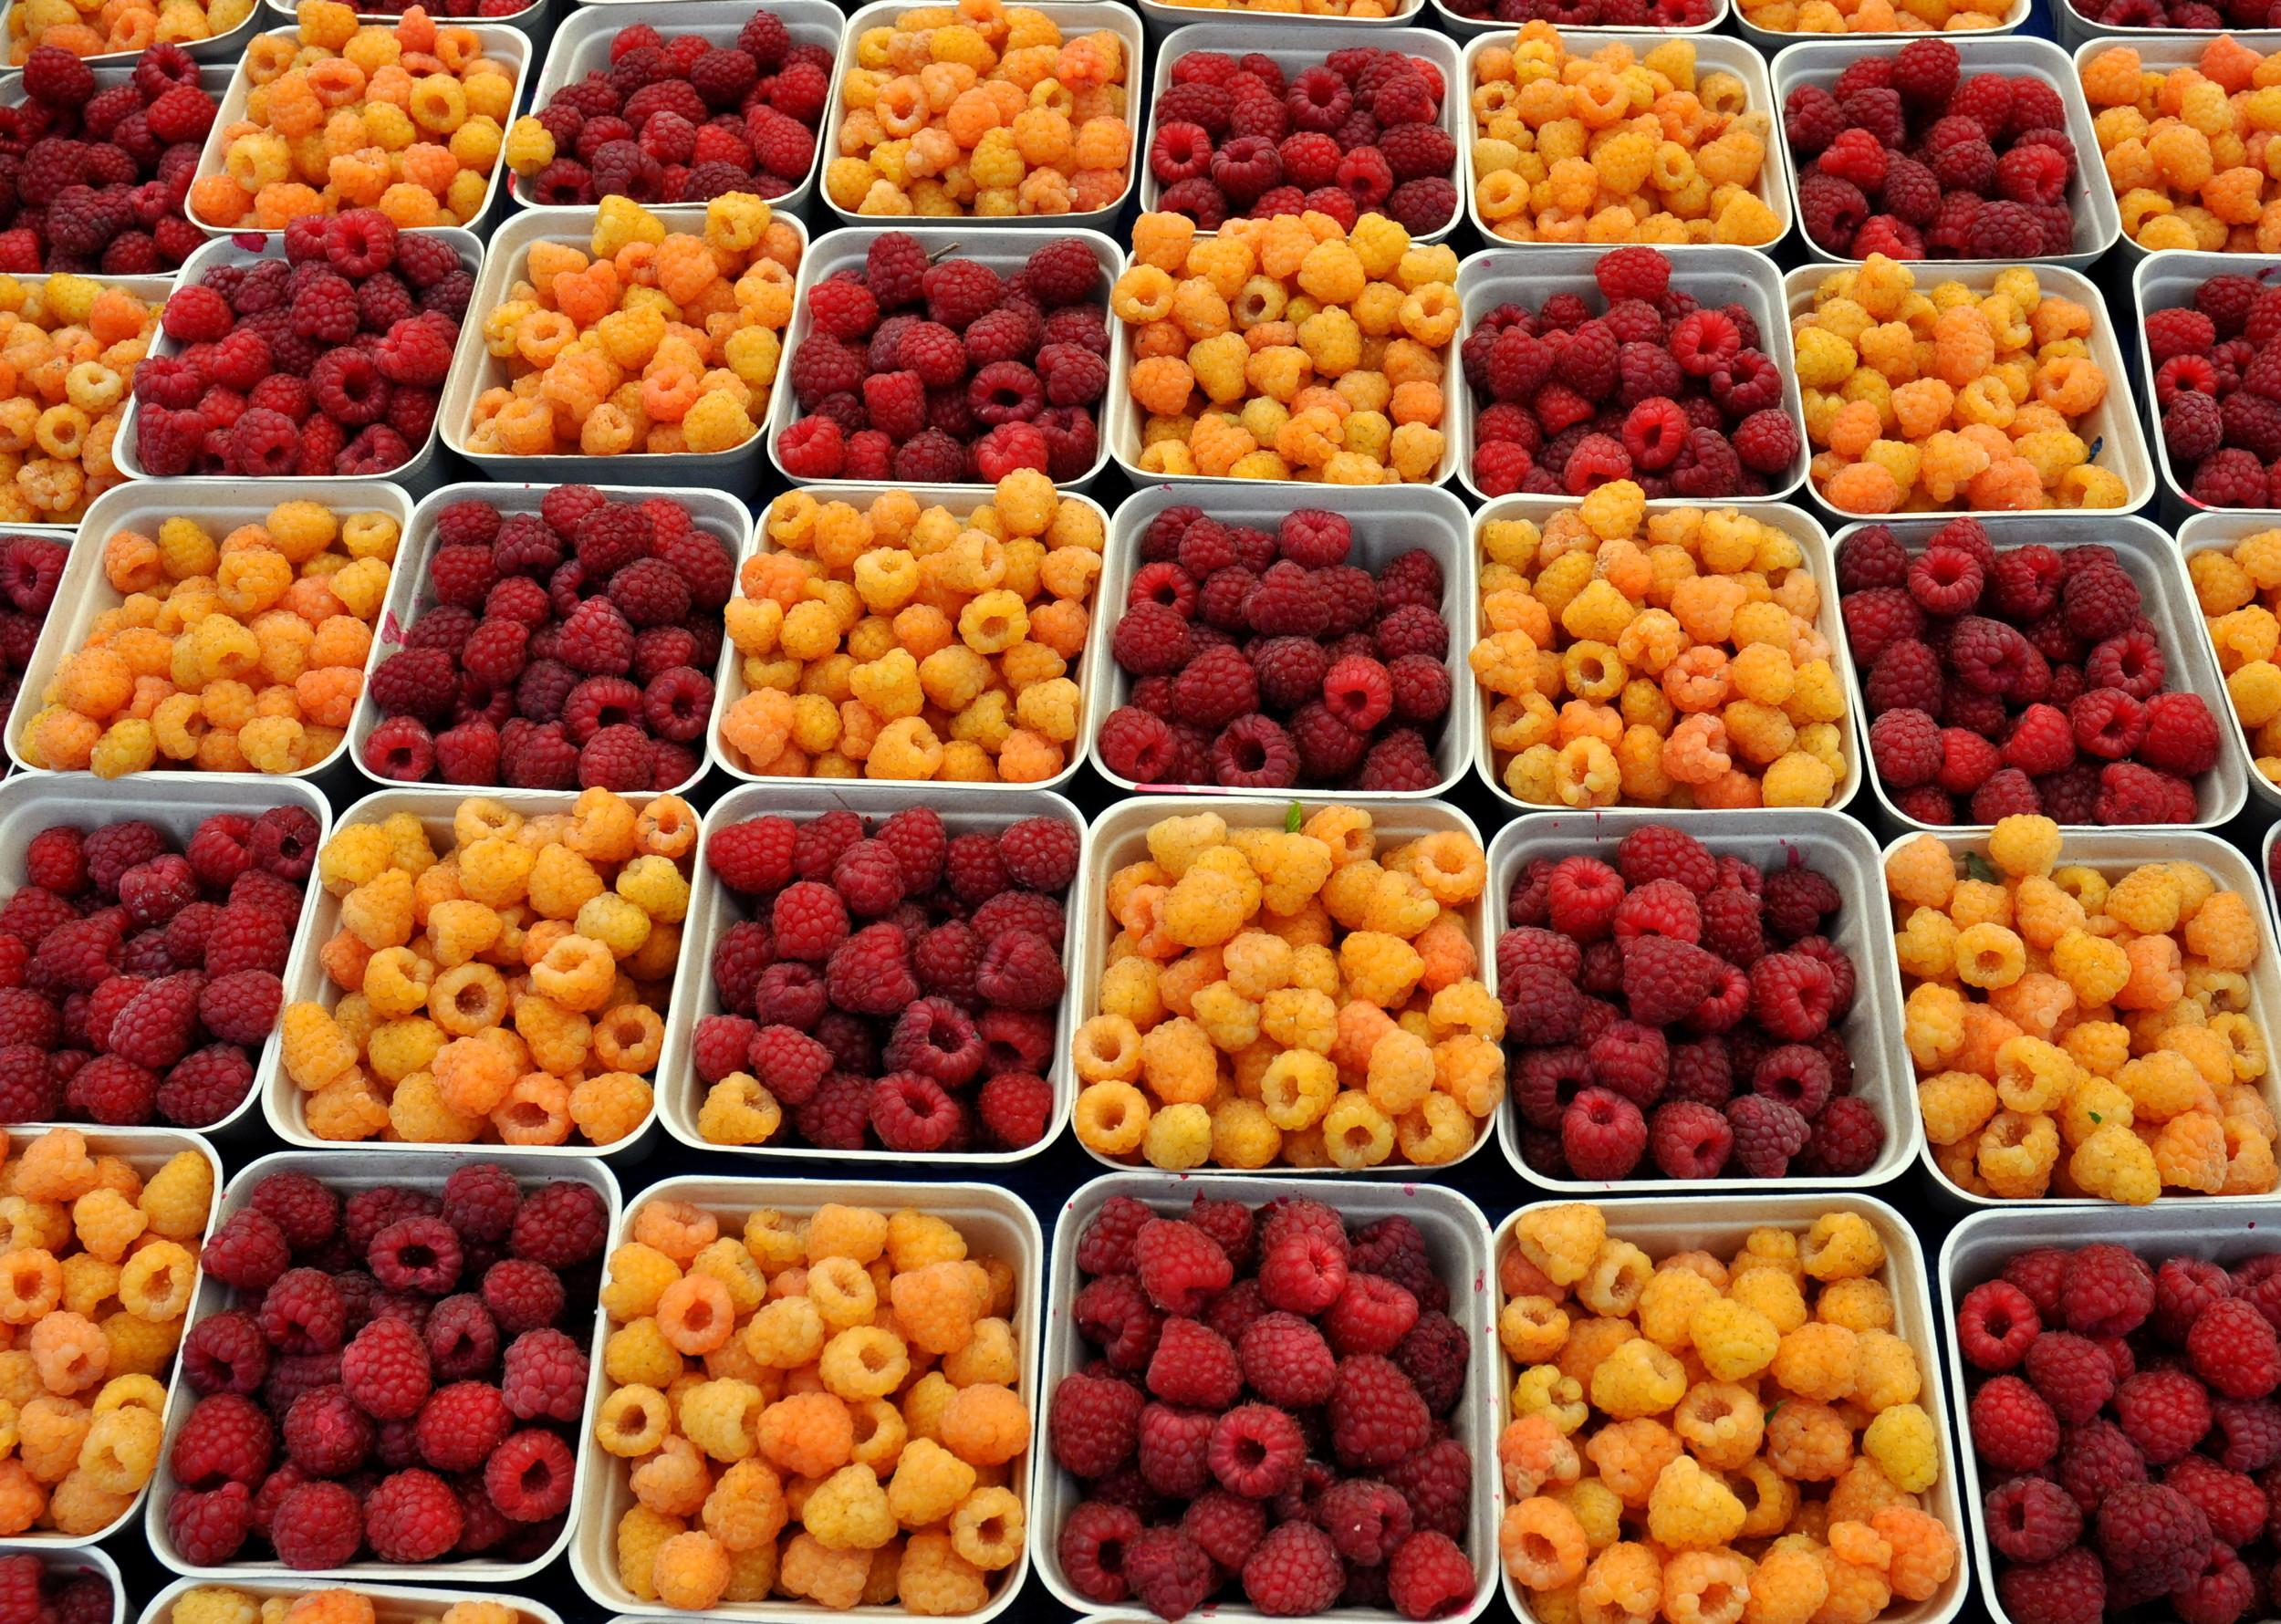 Organic red & salmon raspberries from Gaia's Harmony Farm. Photo copyright 2014 by Zachary D. Lyons.